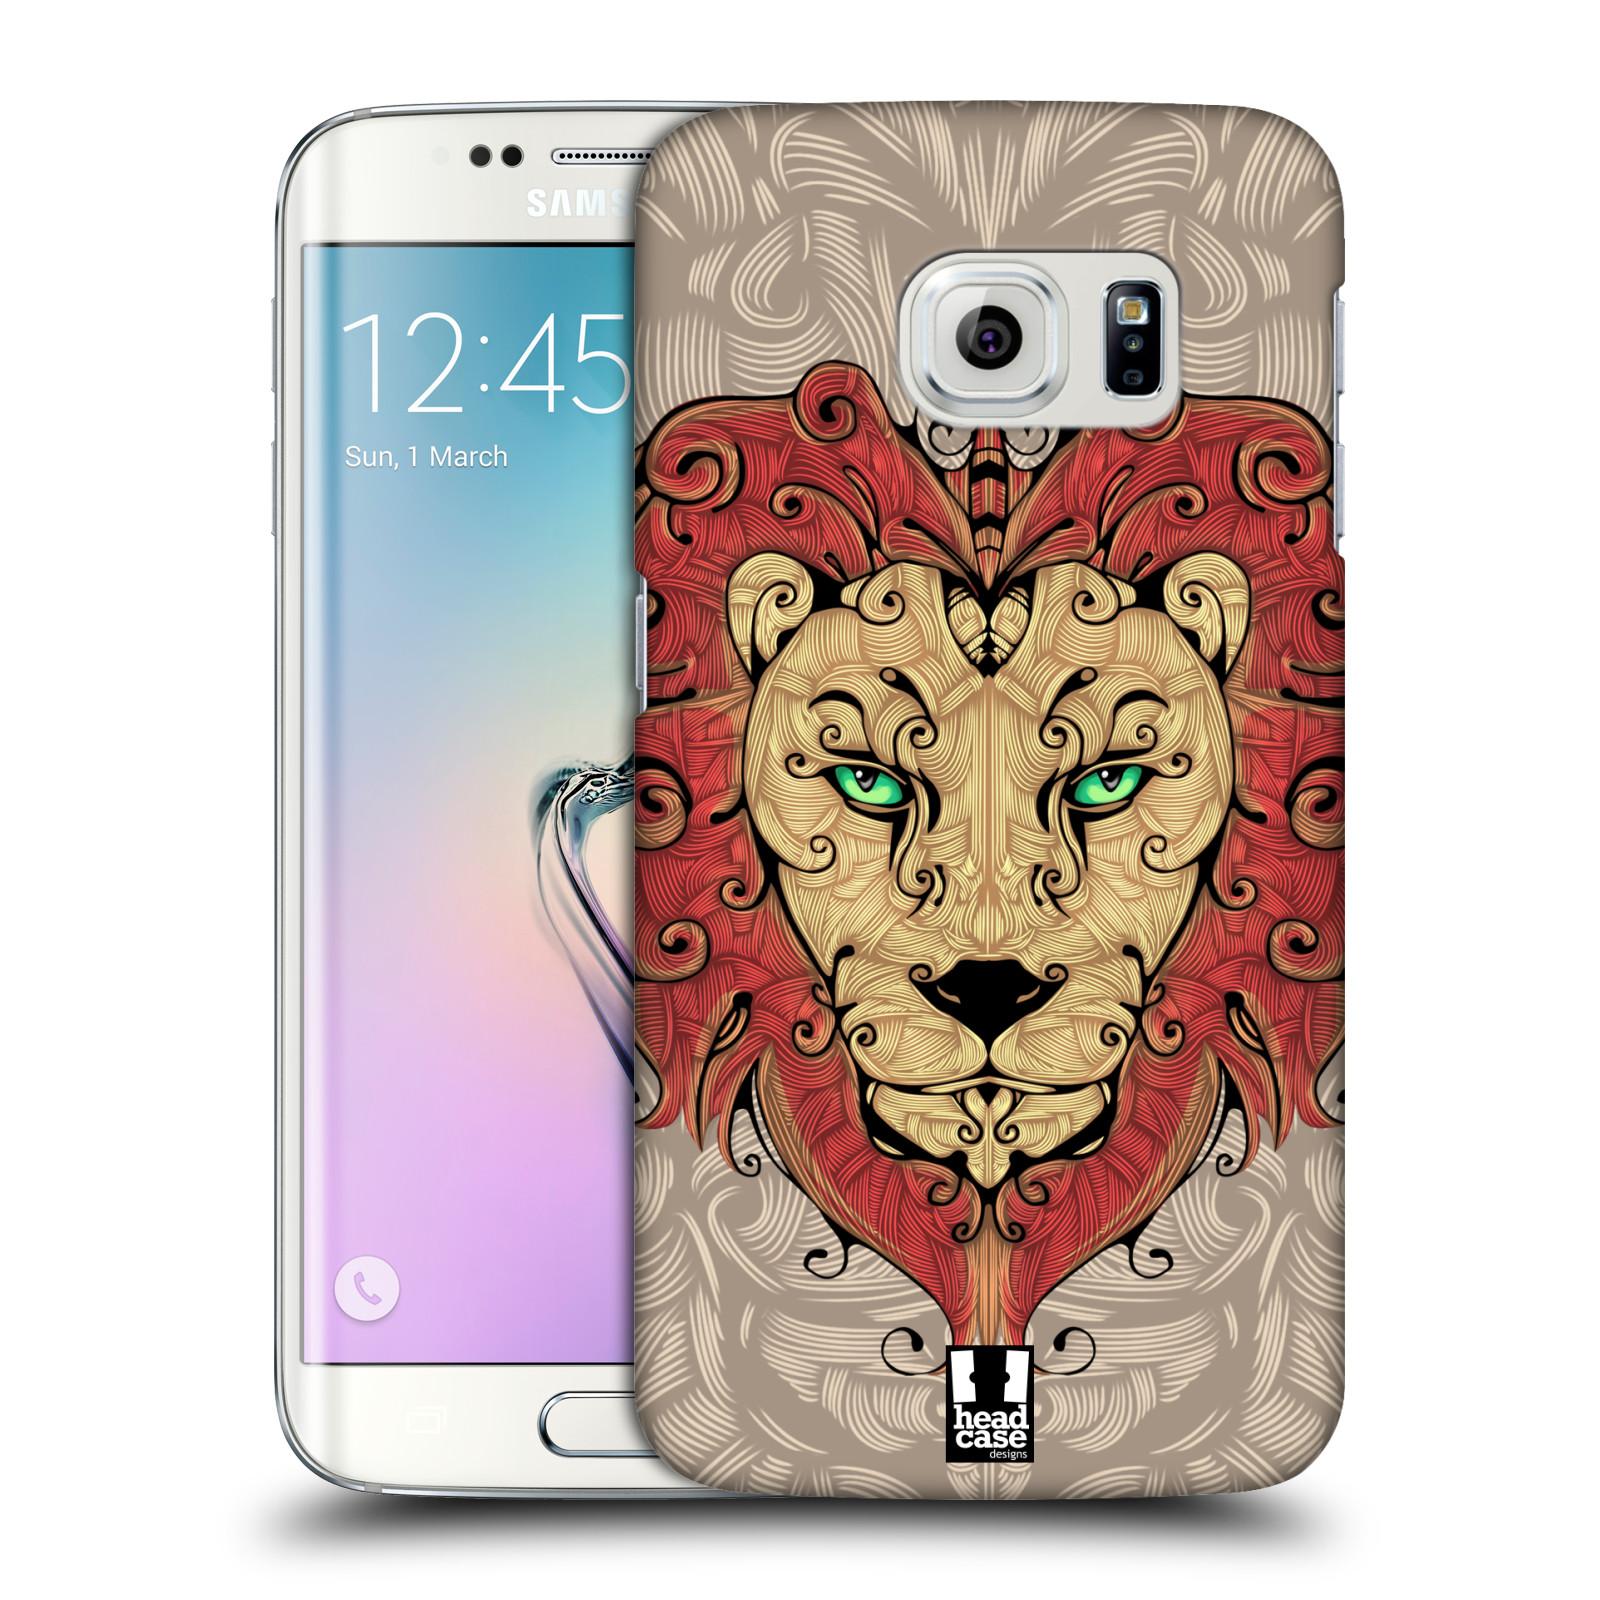 HEAD CASE plastový obal na mobil SAMSUNG Galaxy S6 EDGE (G9250, G925, G925F) vzor kudrlinky zvíře lev